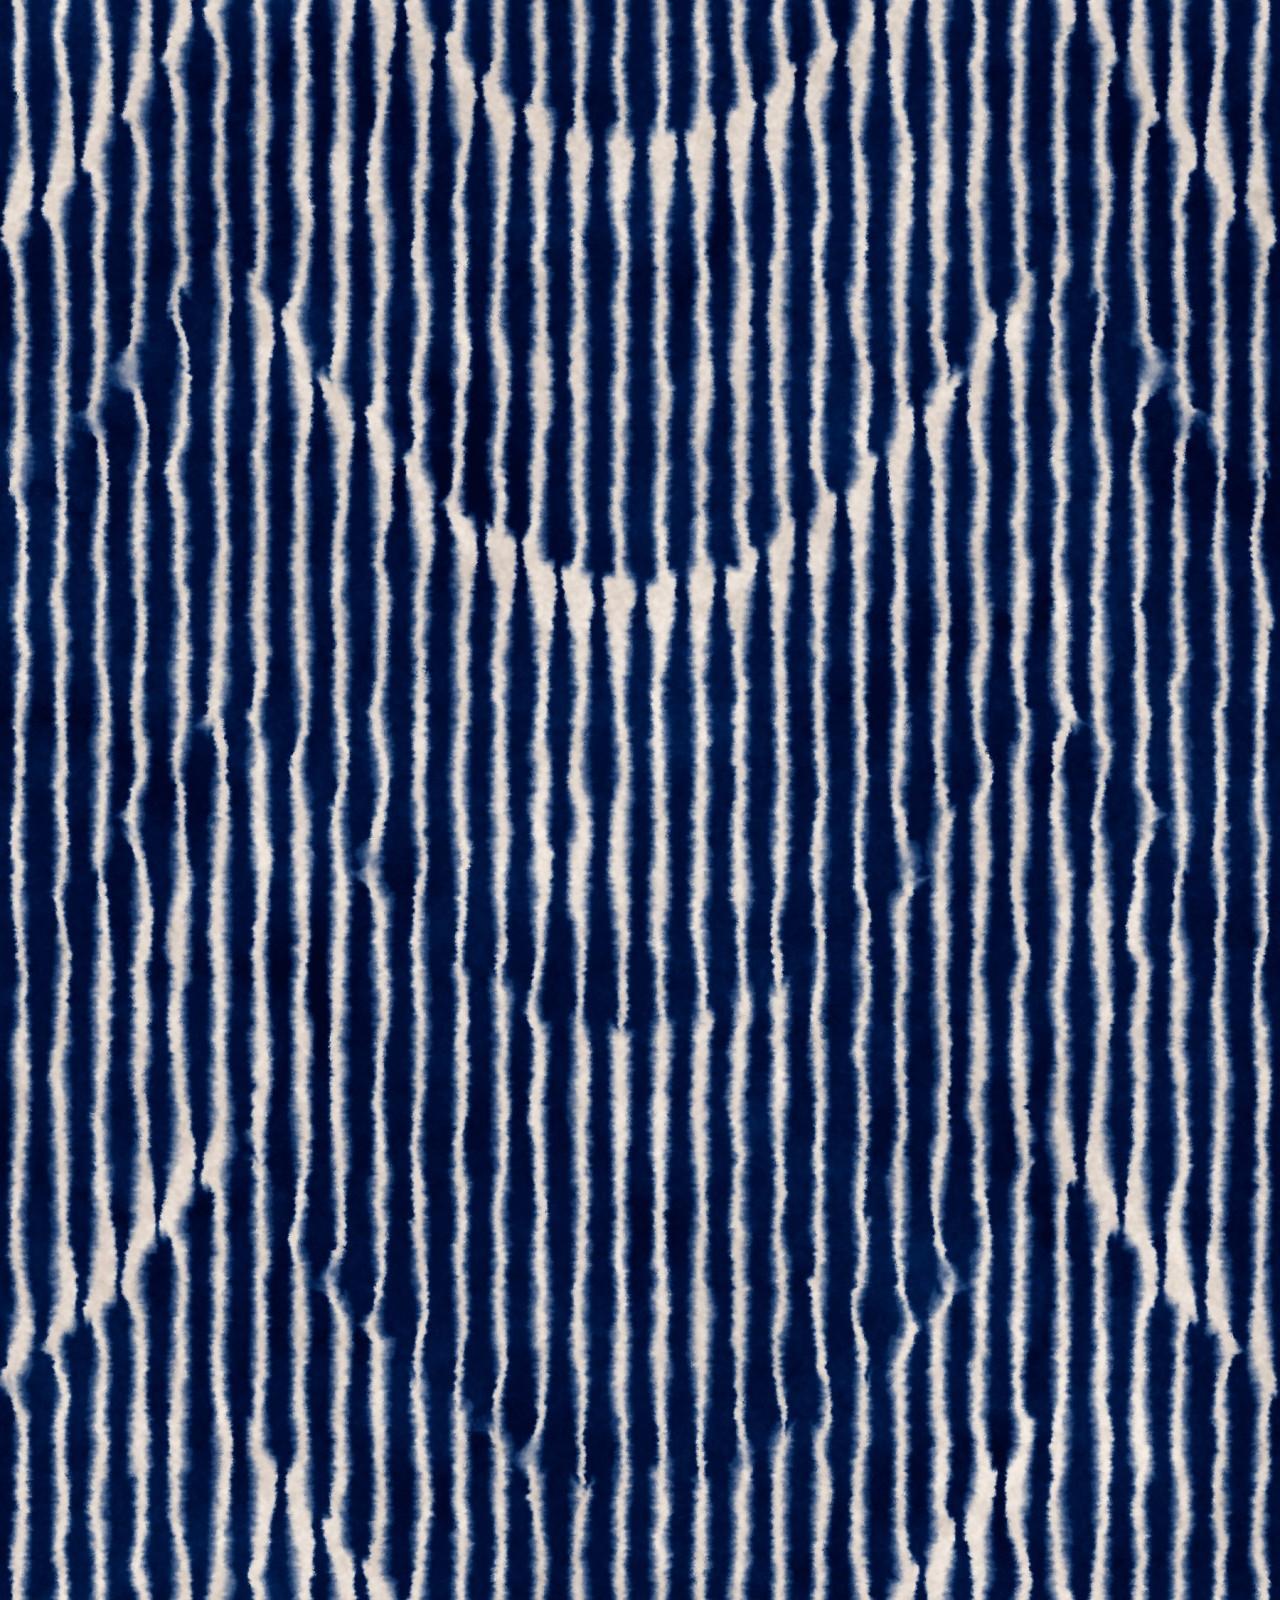 MOVING WAVES Wallpaper